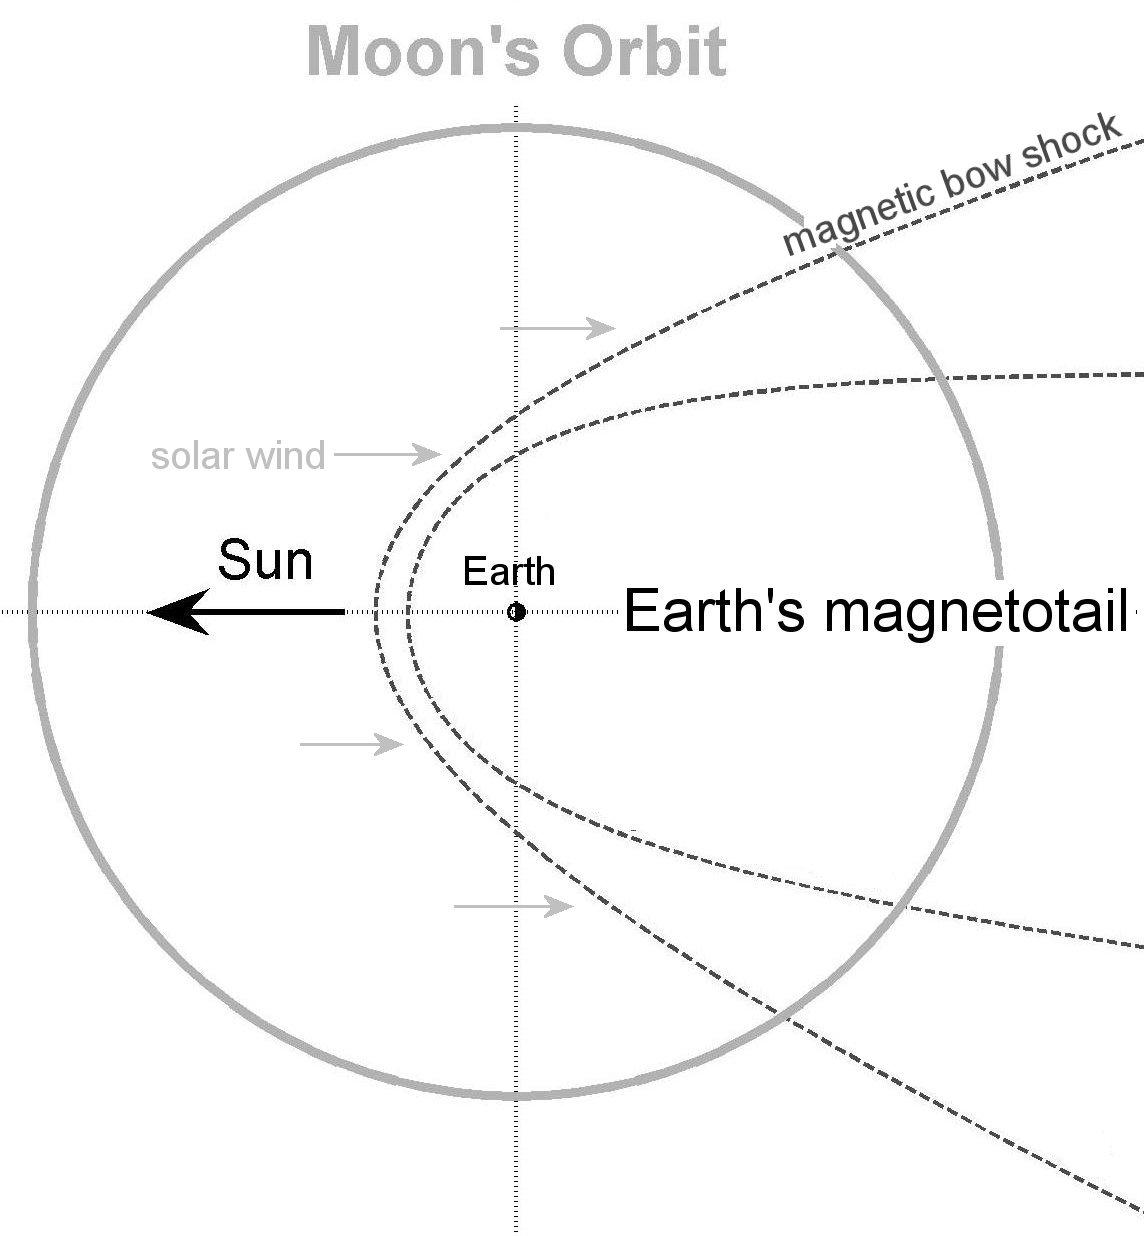 Lunar Atmosphere